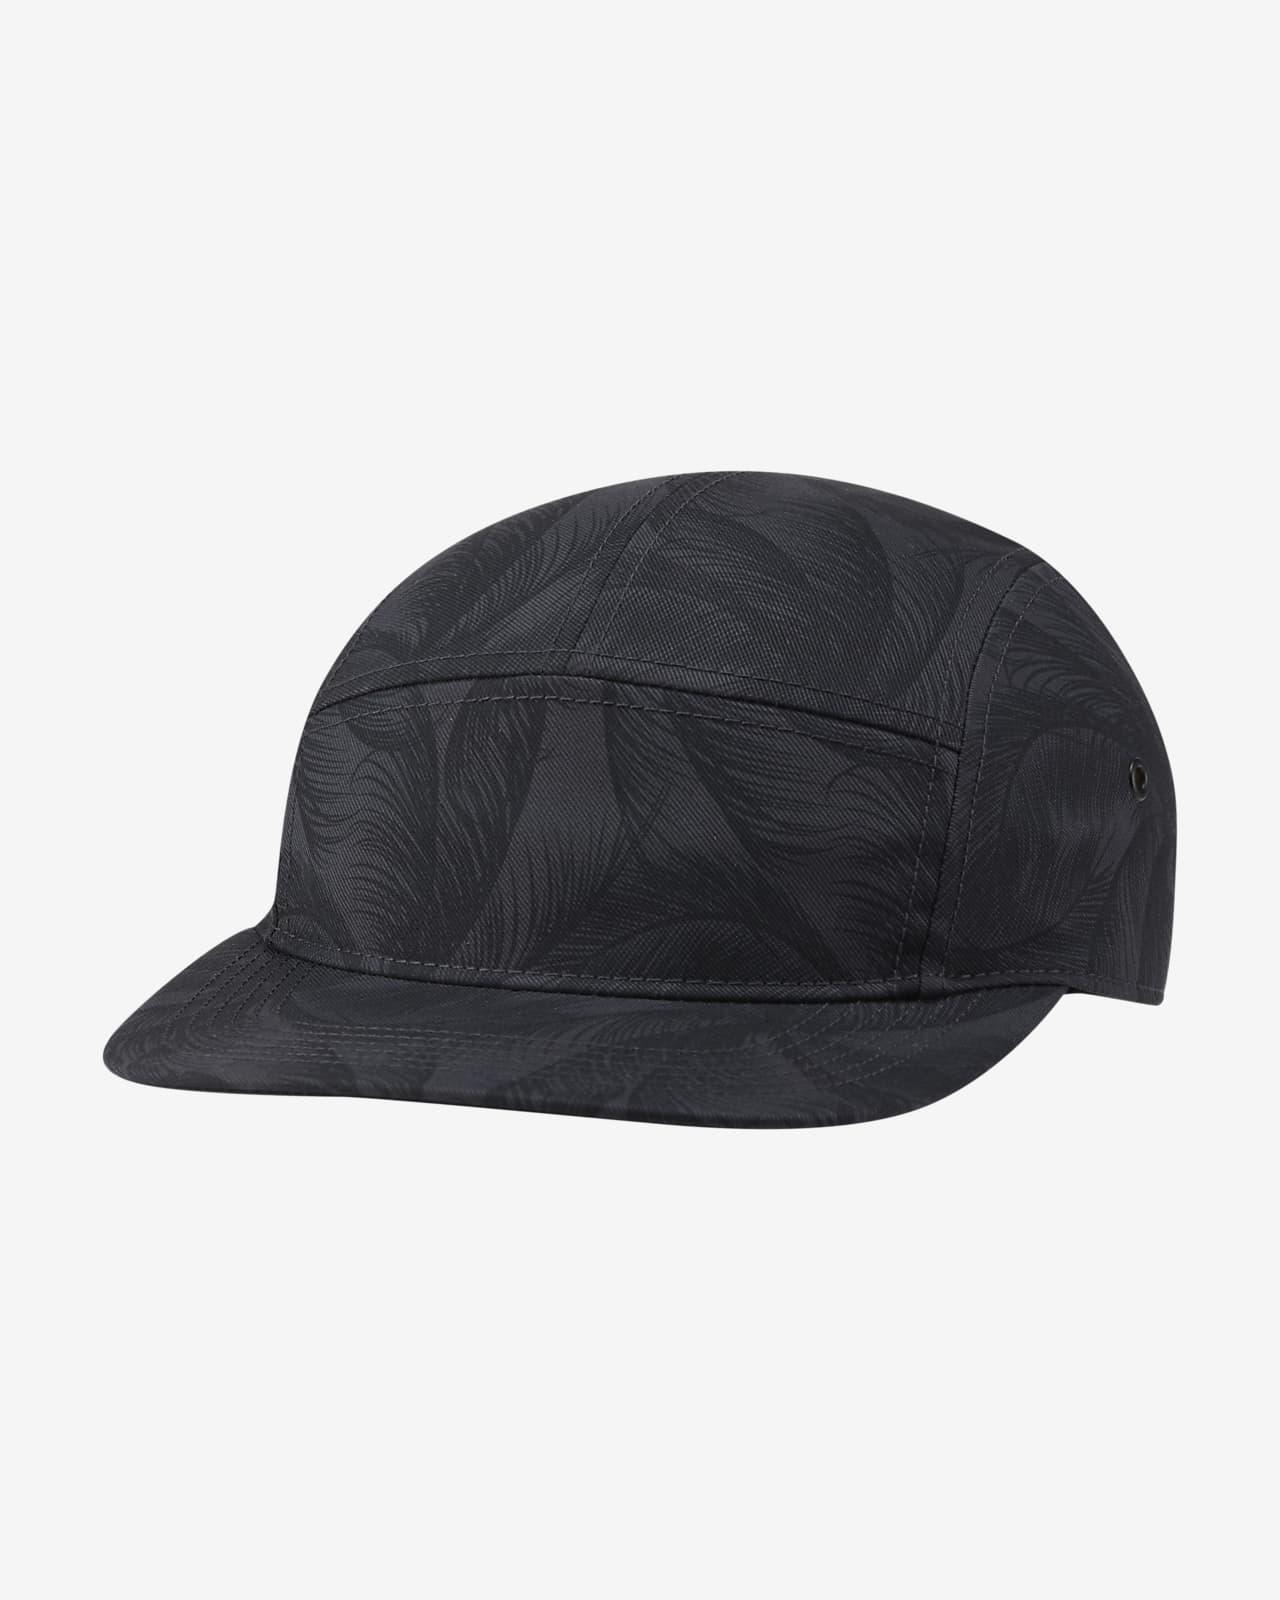 F.C. Barcelona AW84 Hat